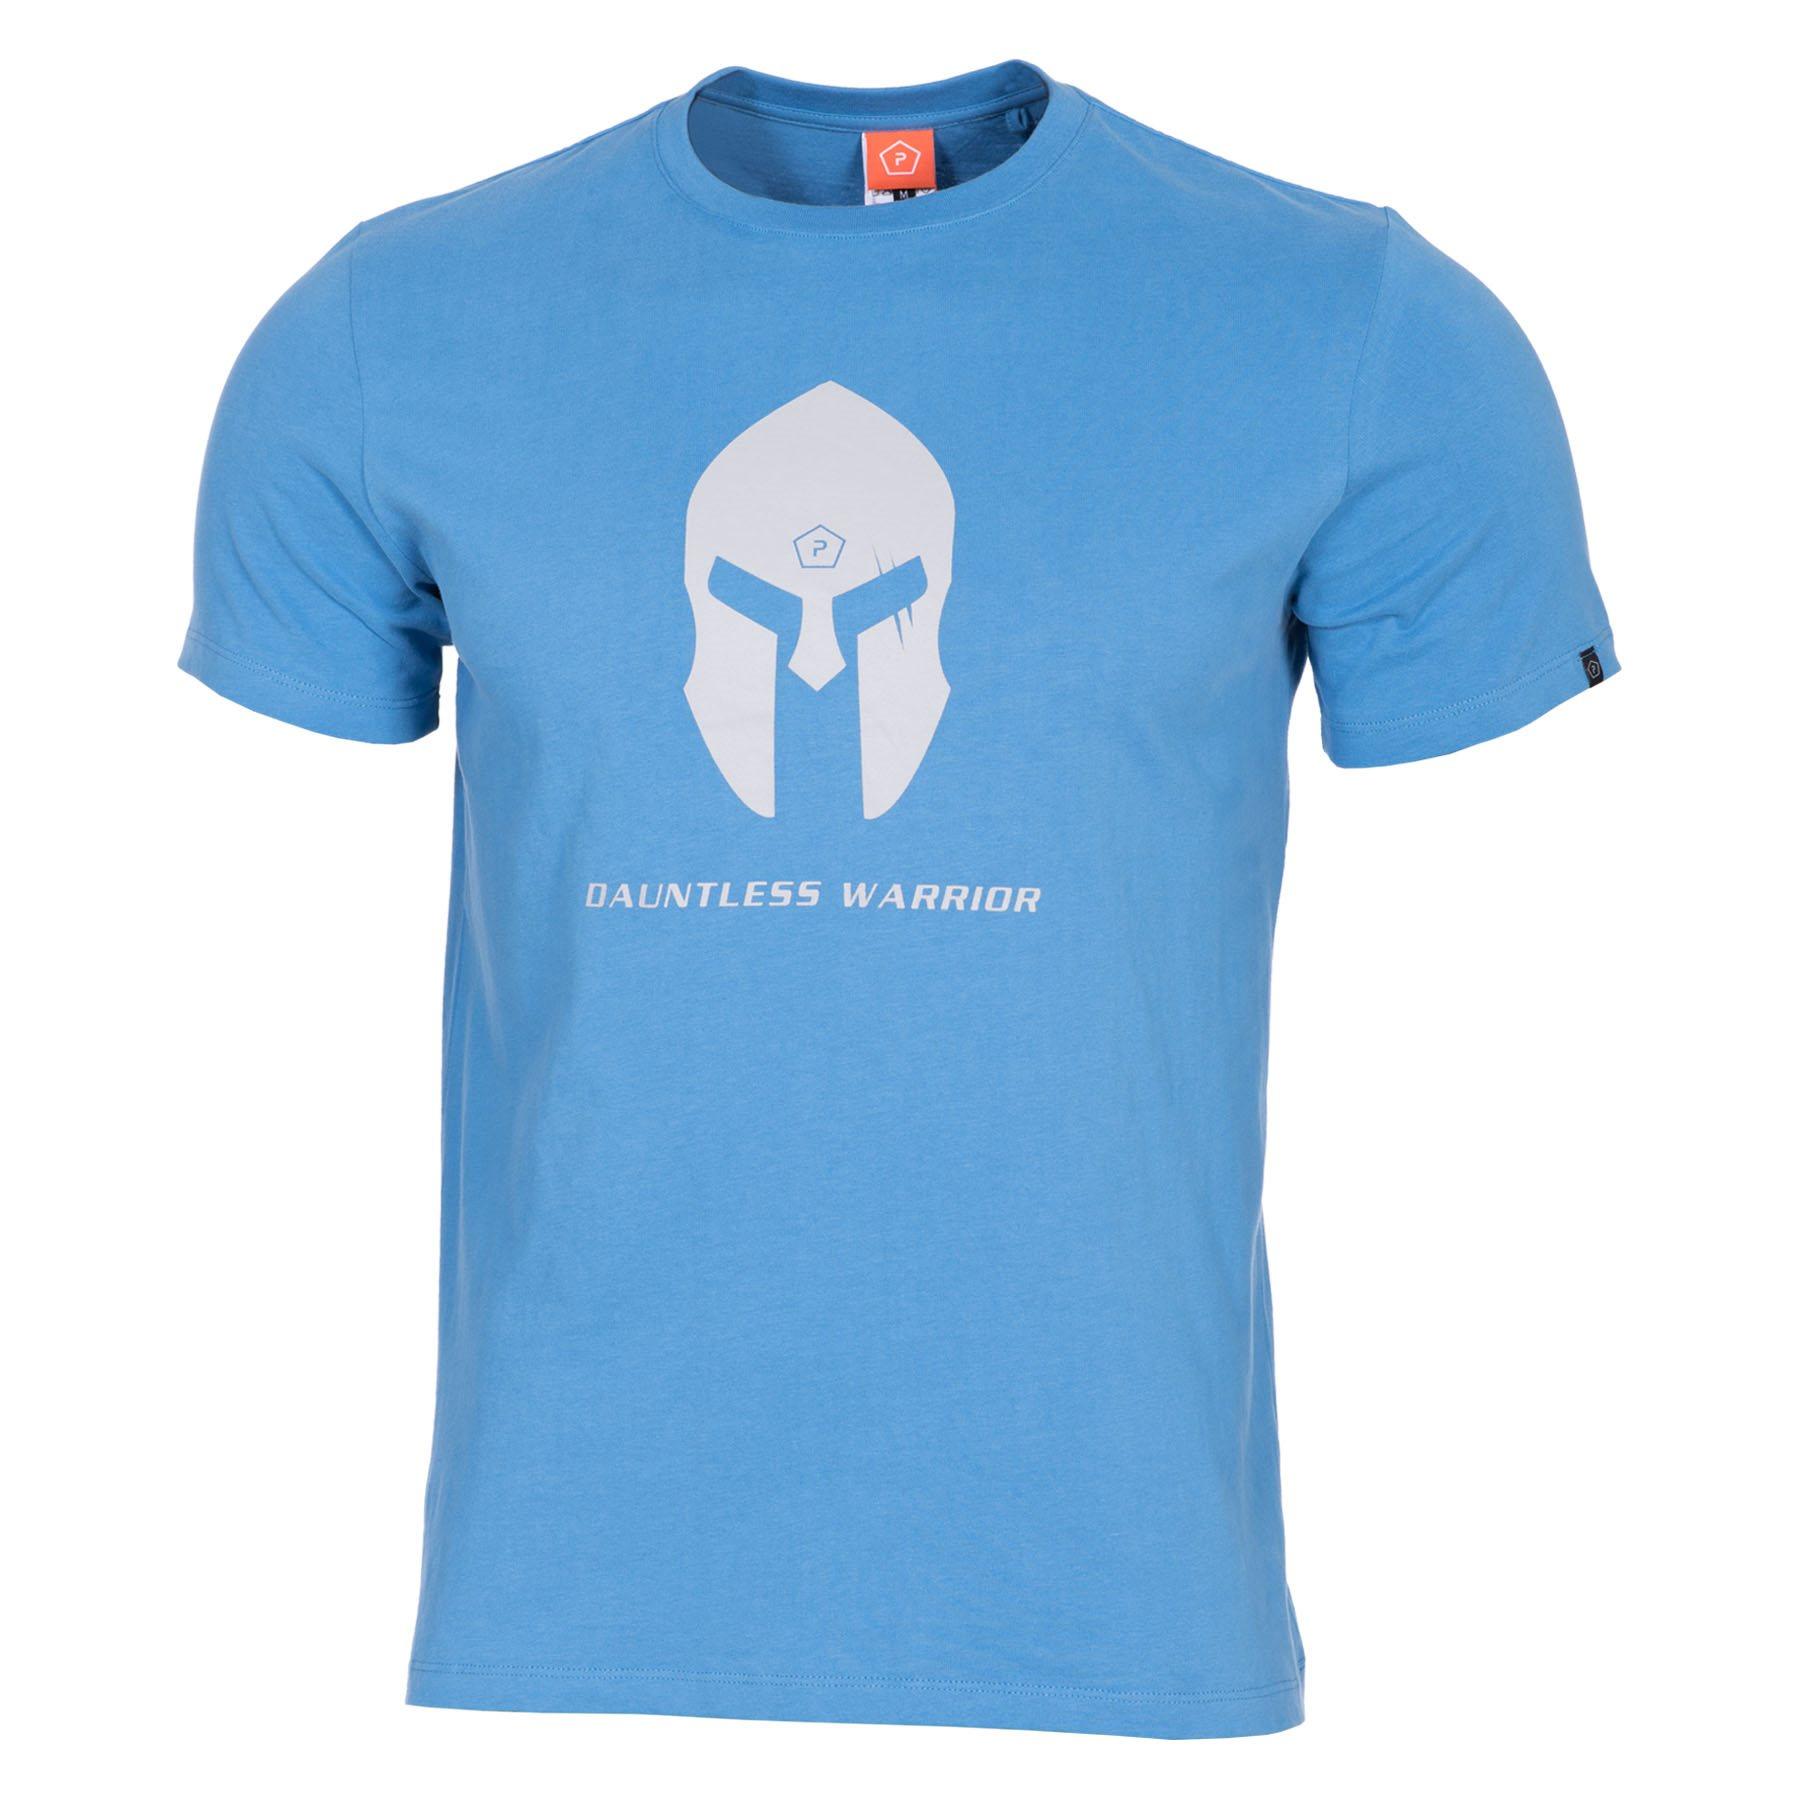 T-shirt SPARTAN HELMET PACIFIC BLUE PENTAGON K09012-SH-25 L-11